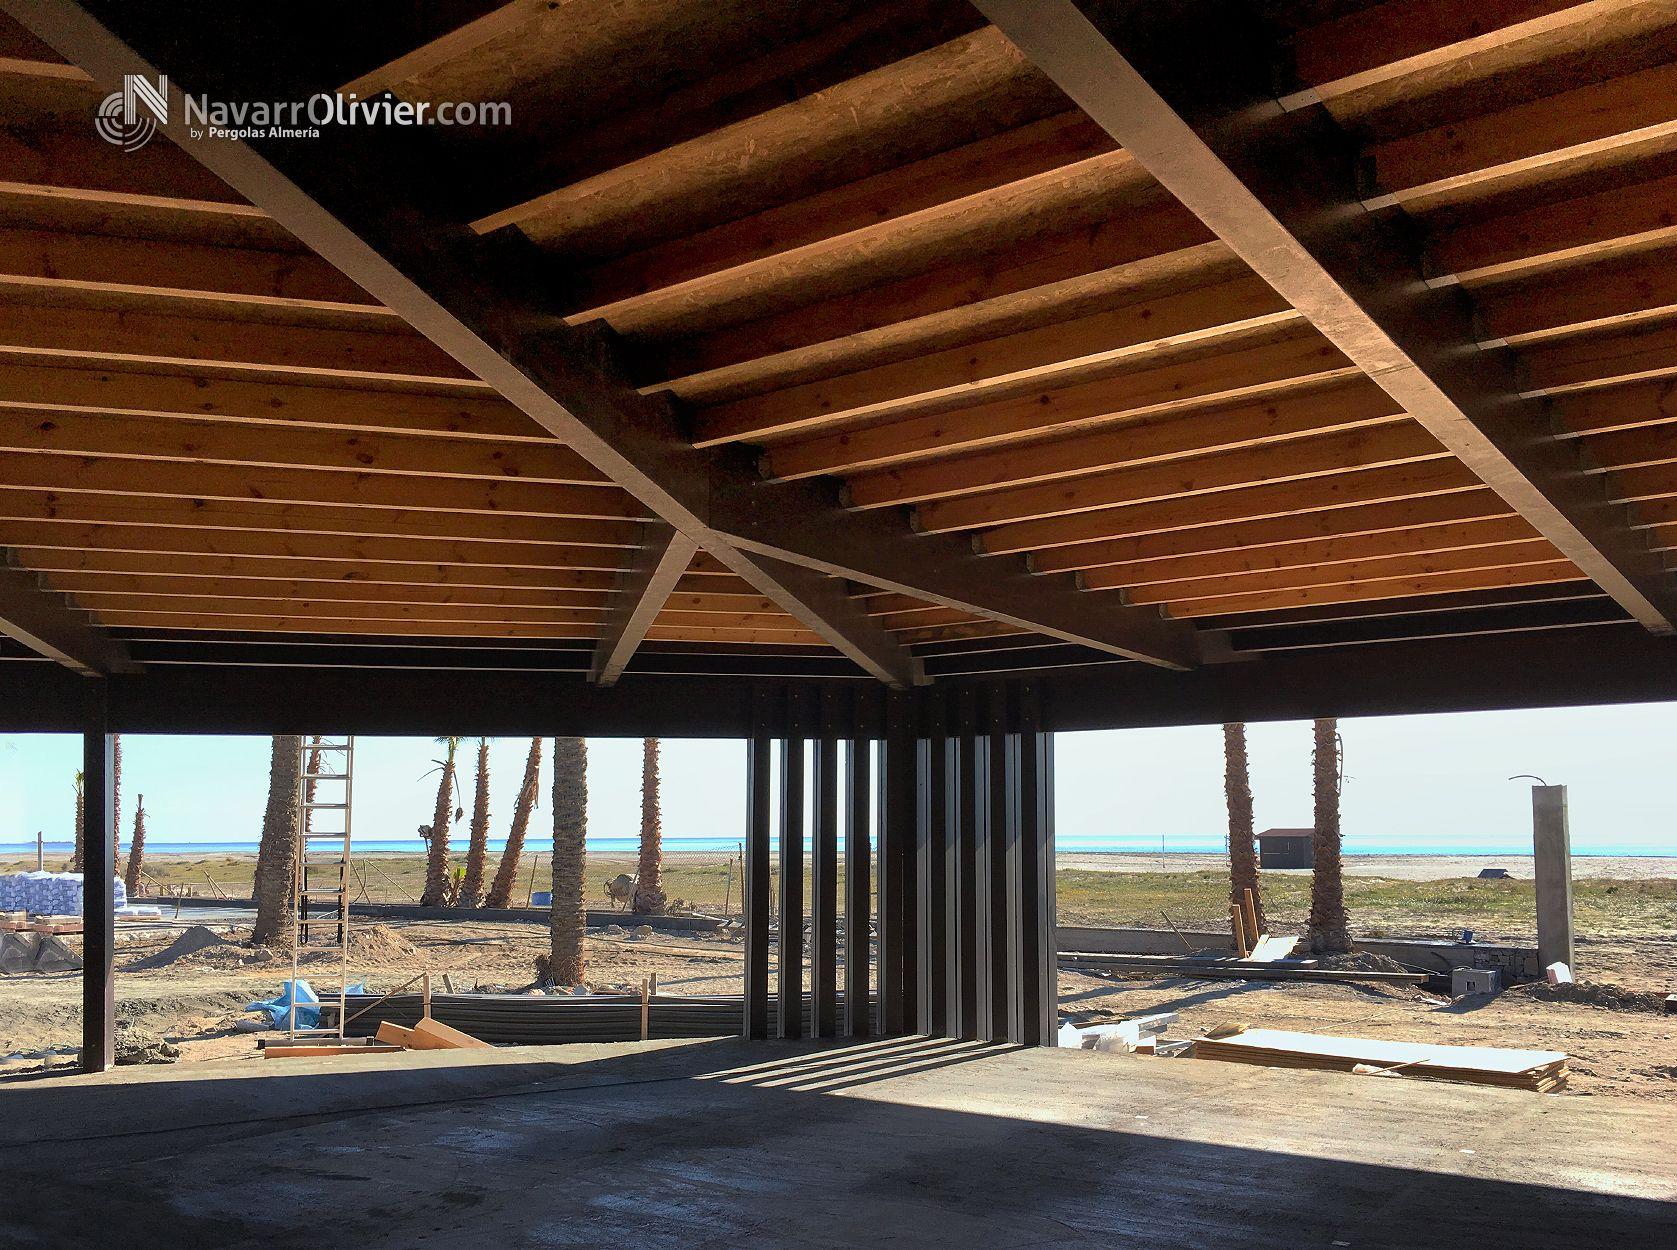 Mara beach club estructuras madera laminada vigas de madera laminada y vigas de madera - Cubiertas de madera laminada ...